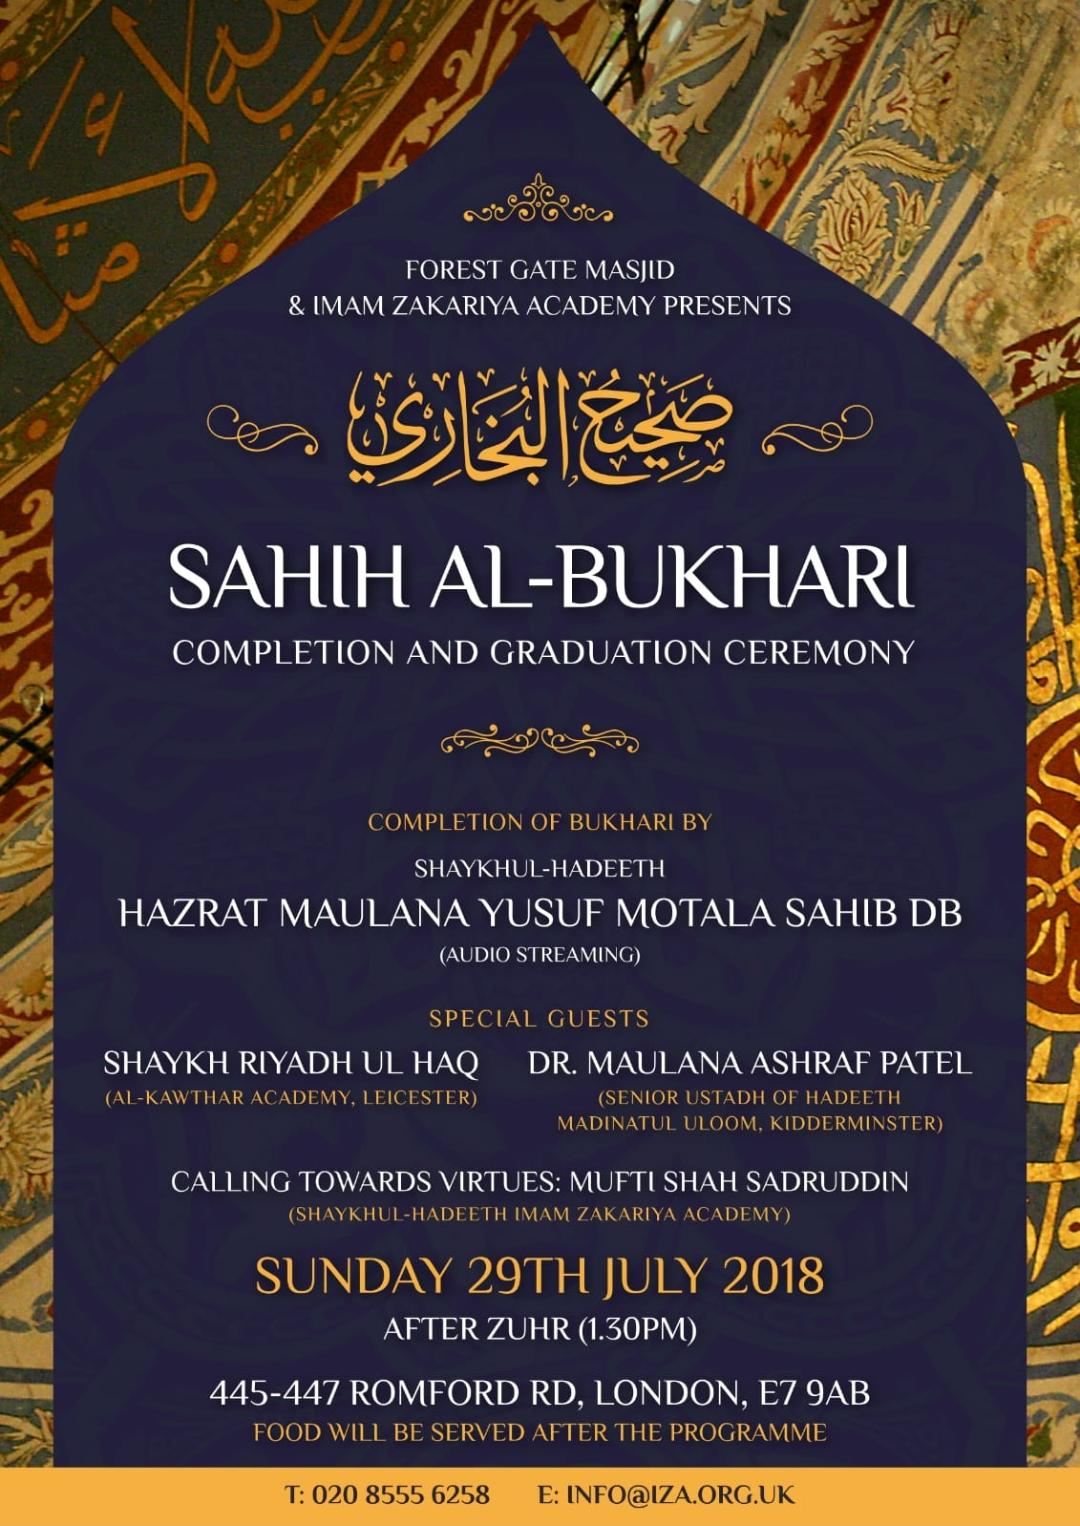 Sahih al-Bukhari Completion & Graduation Ceremony